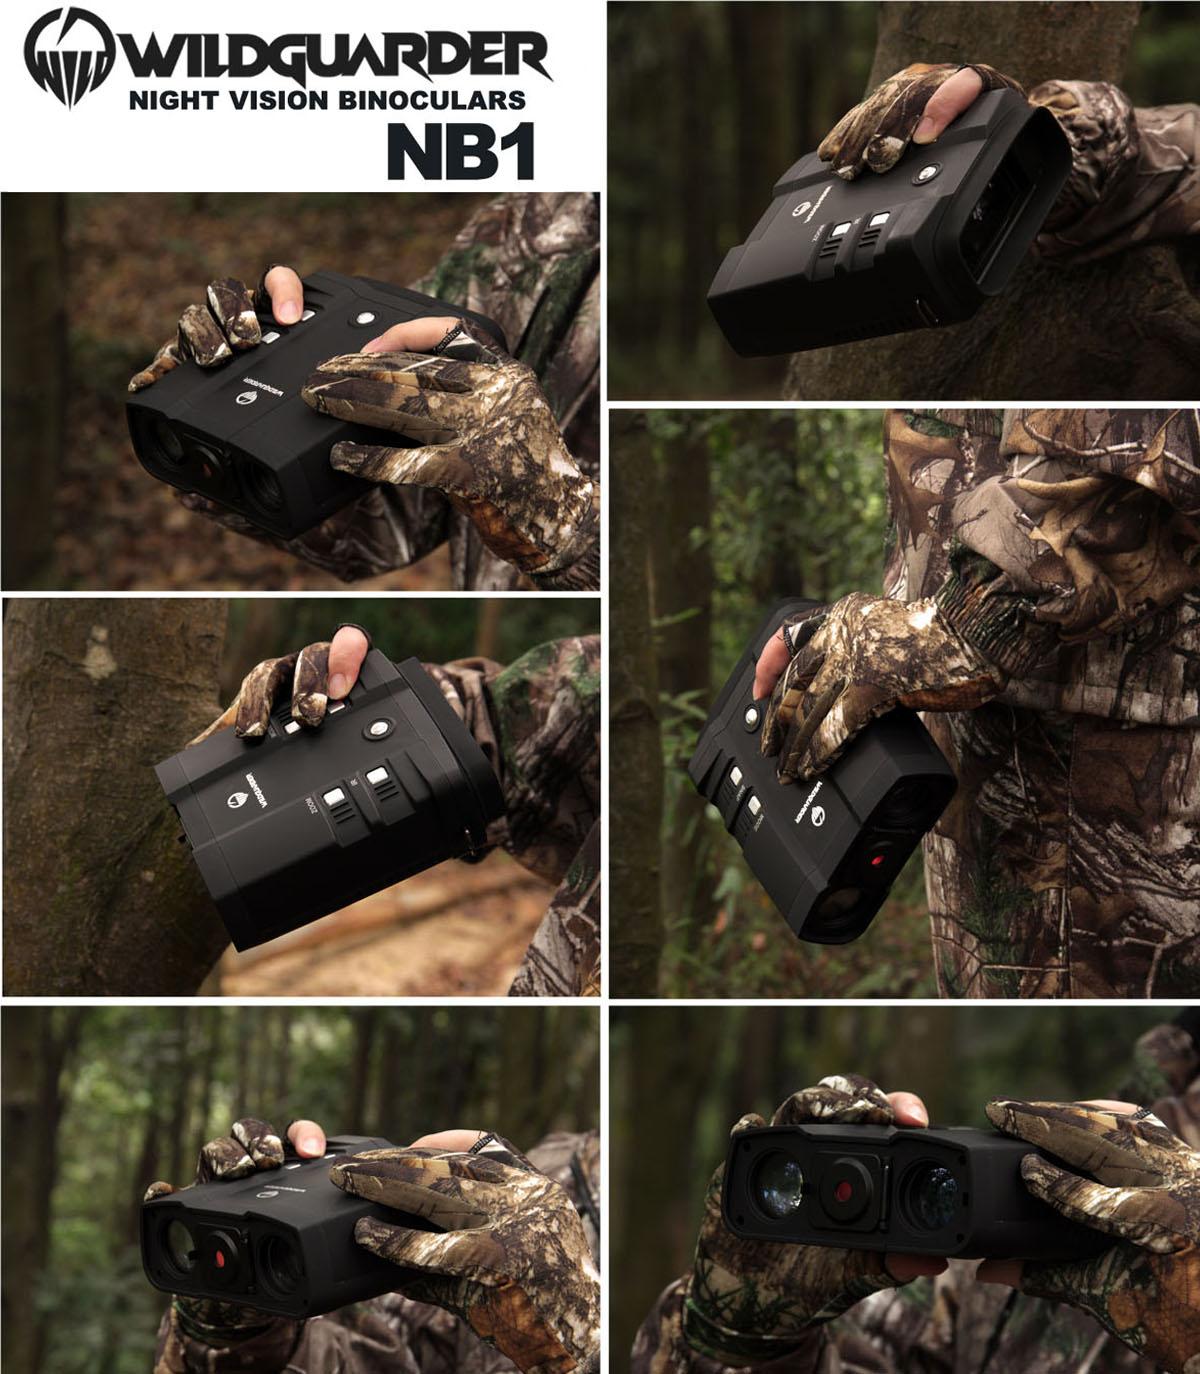 WildGuarder NB1 - Best Night Vision Binoculars 2